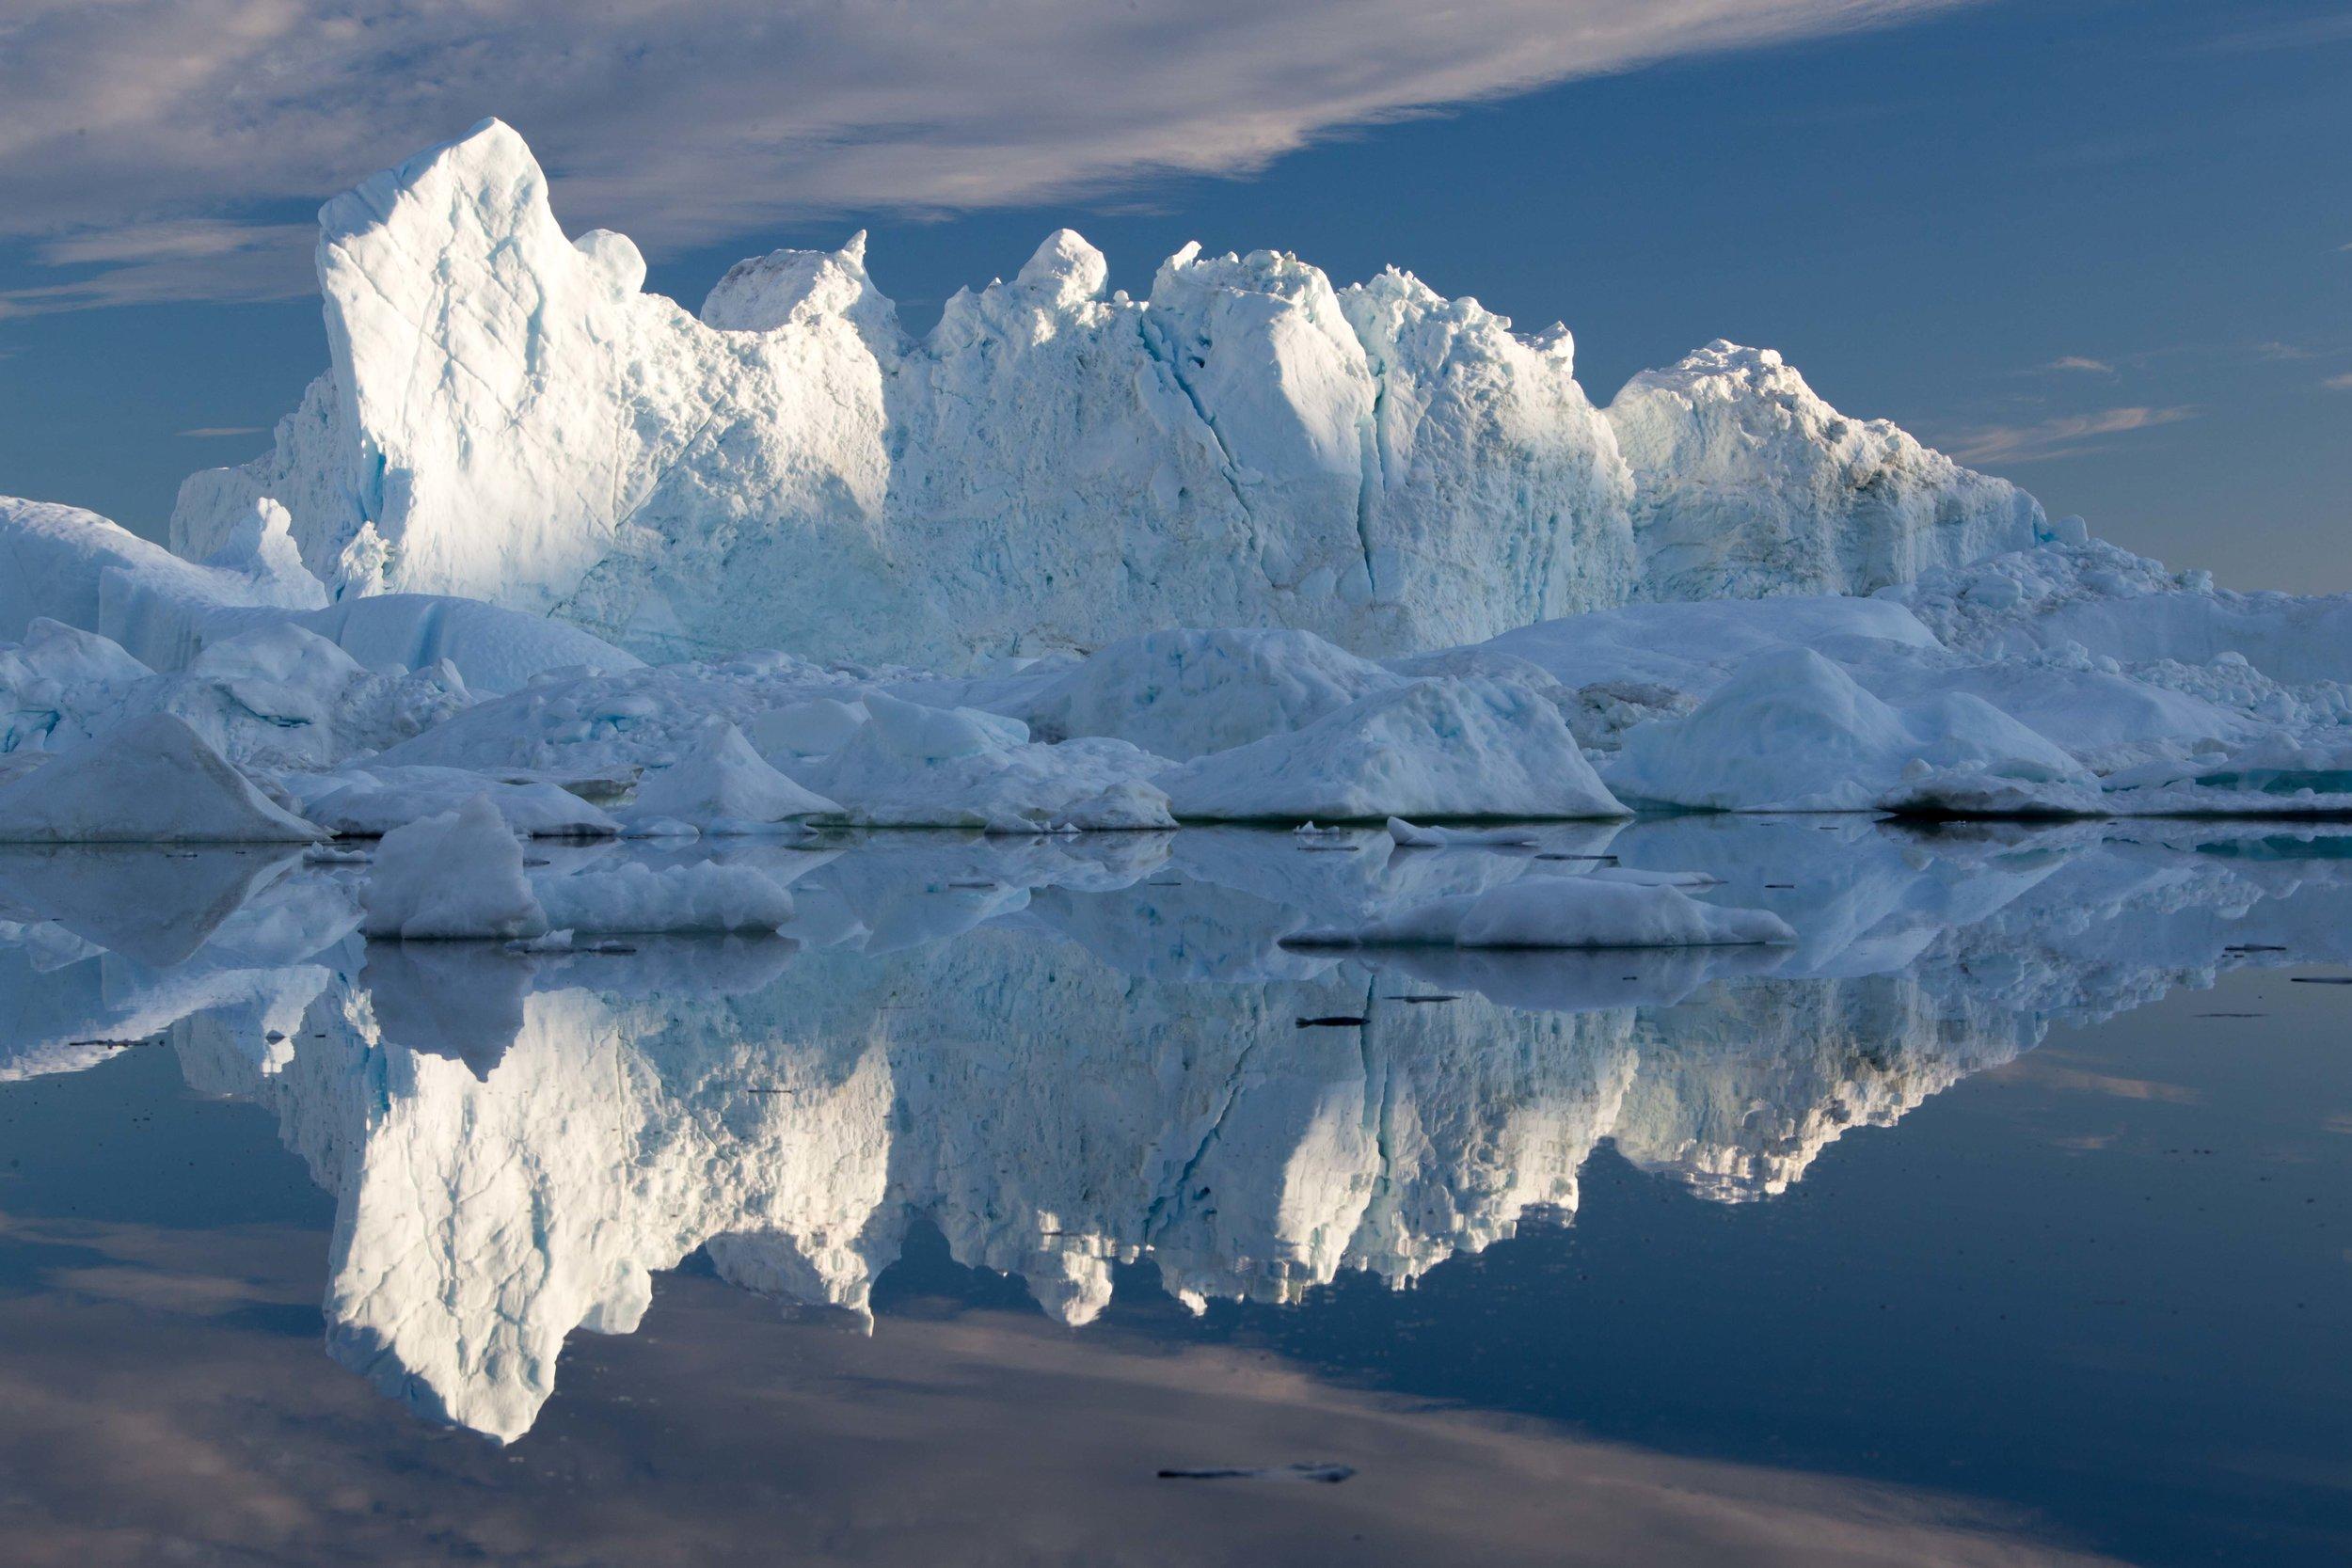 A massive iceberg rests in the Ilulissat Ice Fjord, West Greenland. Photo: Matt Reichel.